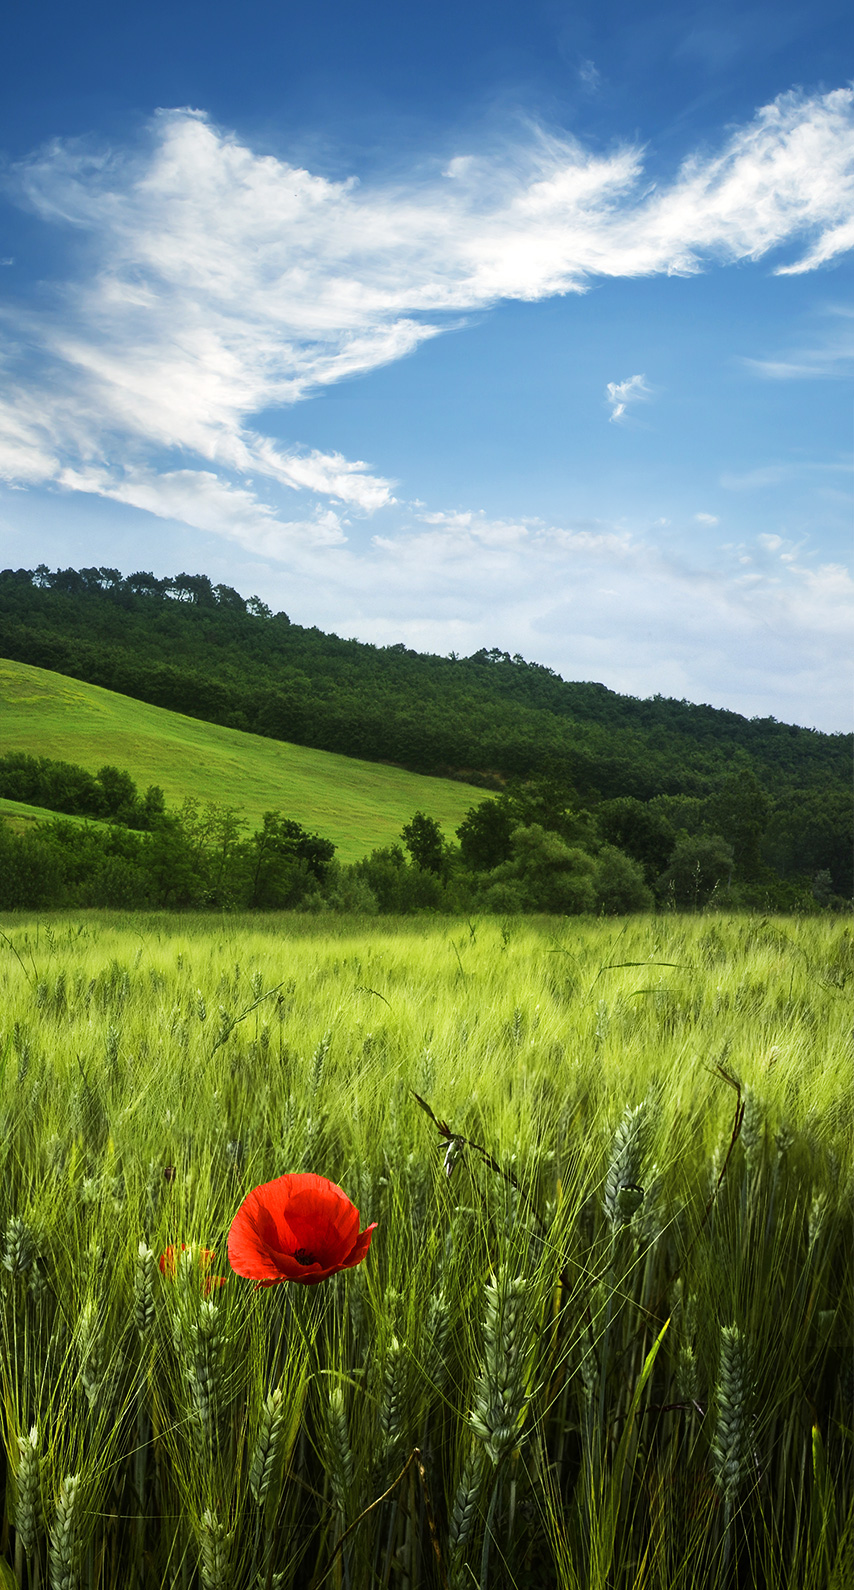 cropland, pasture